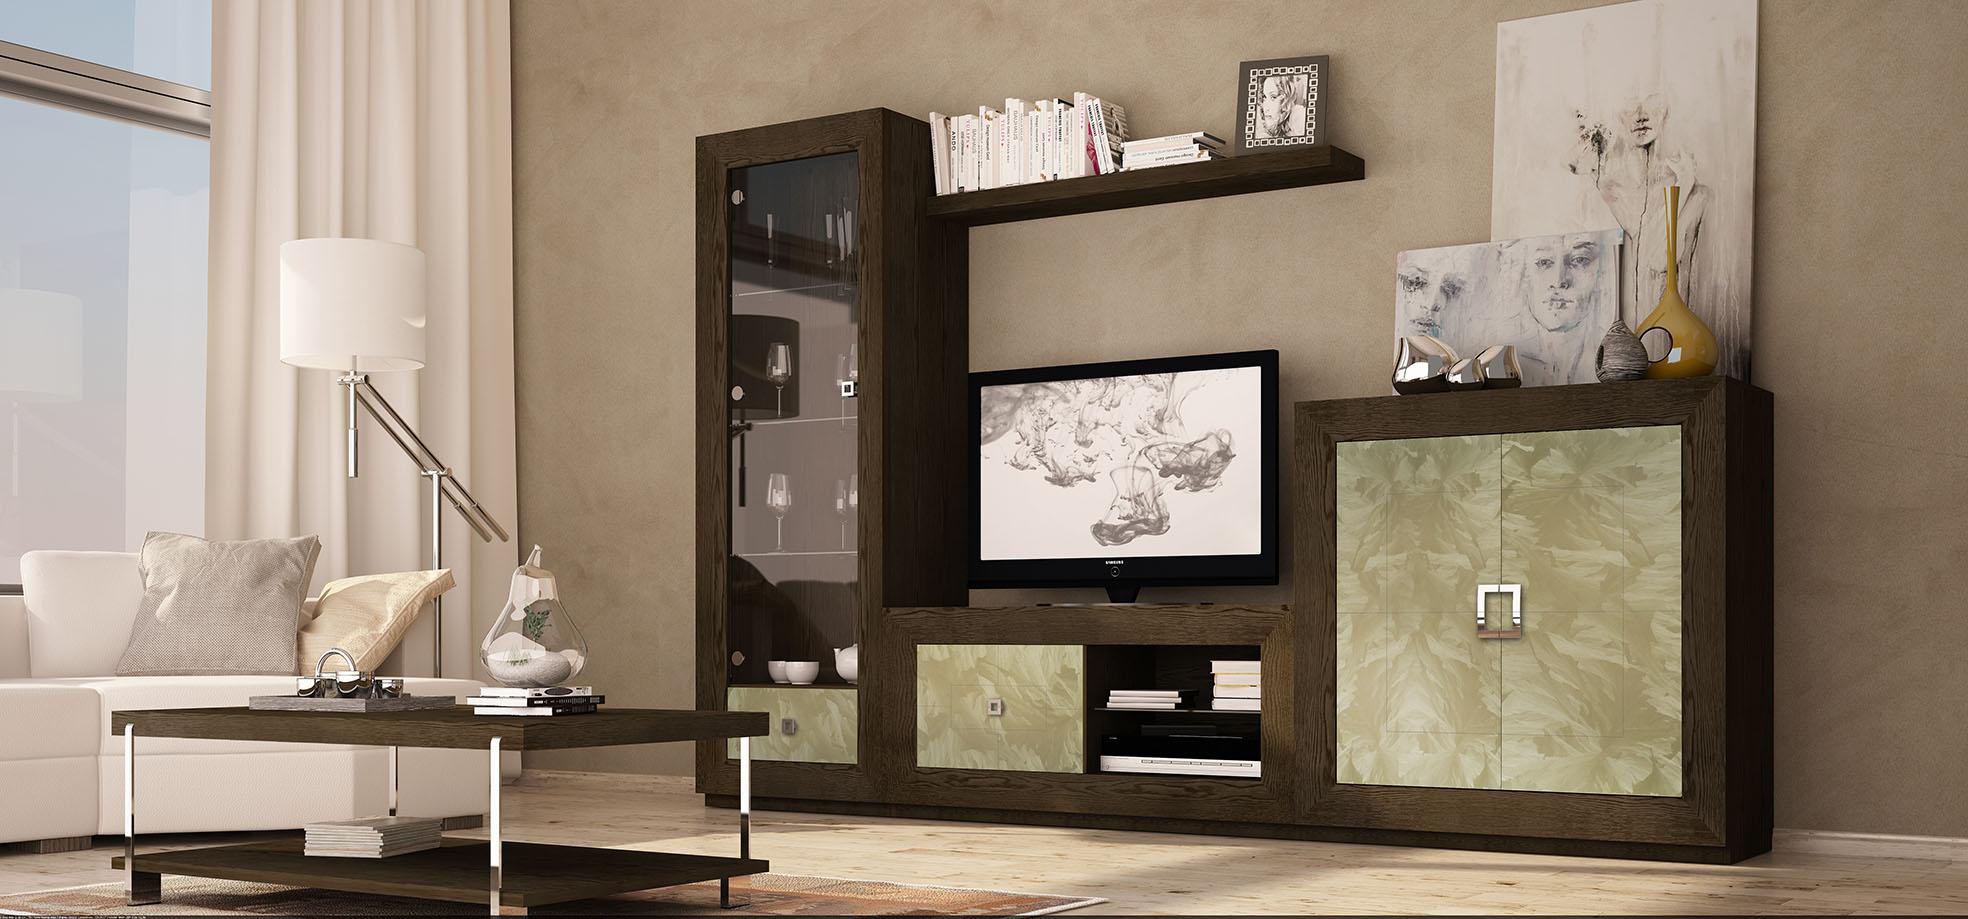 salon-contemporaneo-Basik-muebles-paco-caballero-1231-5c93923dd945b